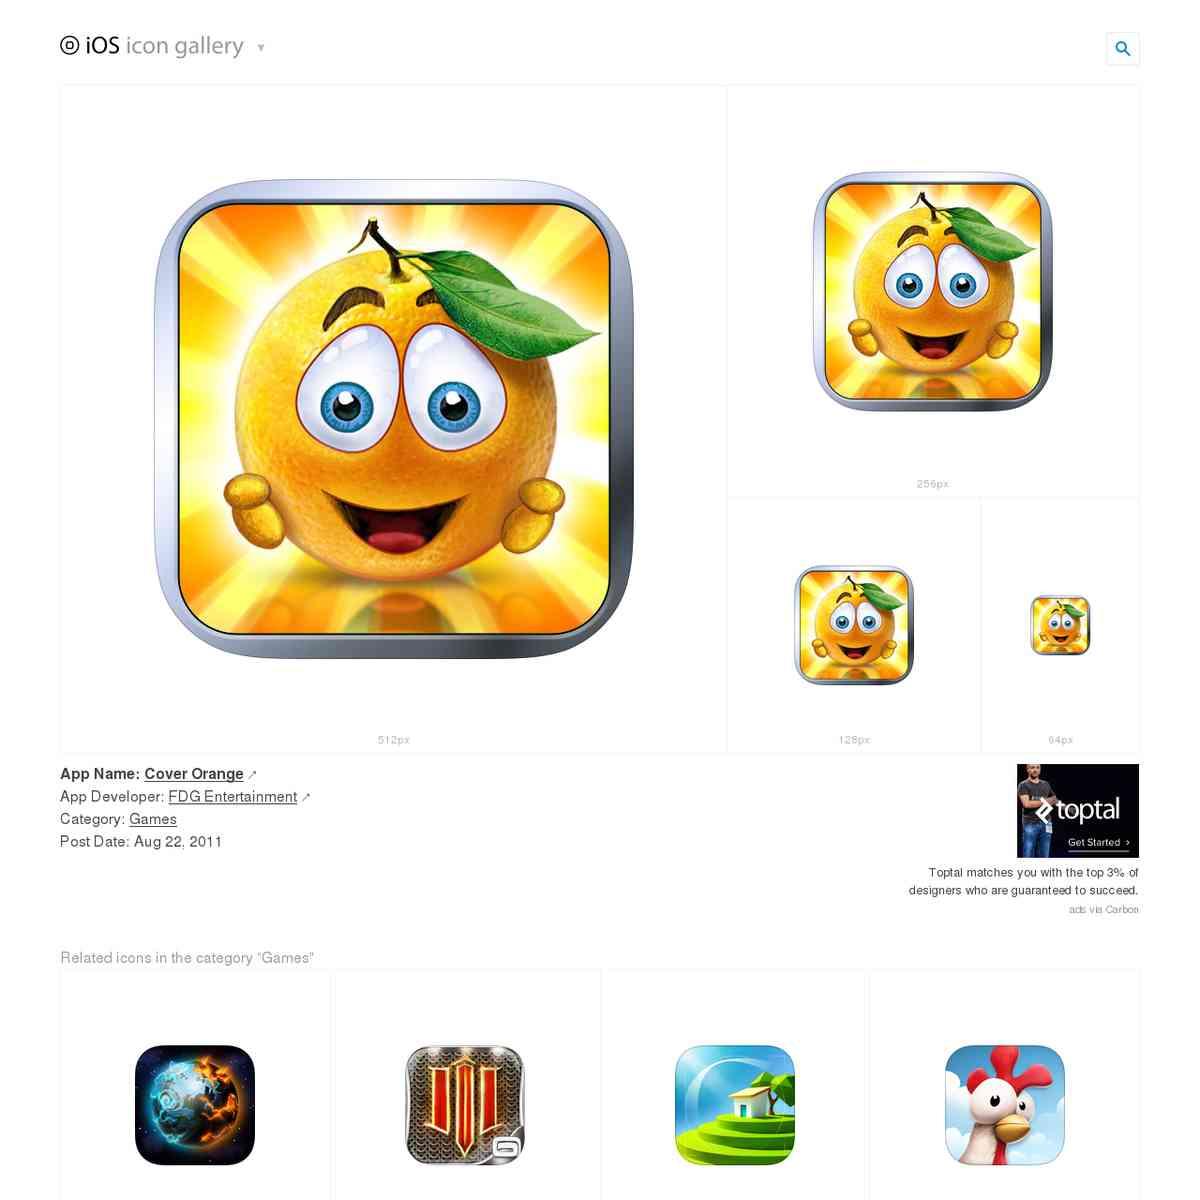 iosicongallery.com/games/cover-orange/